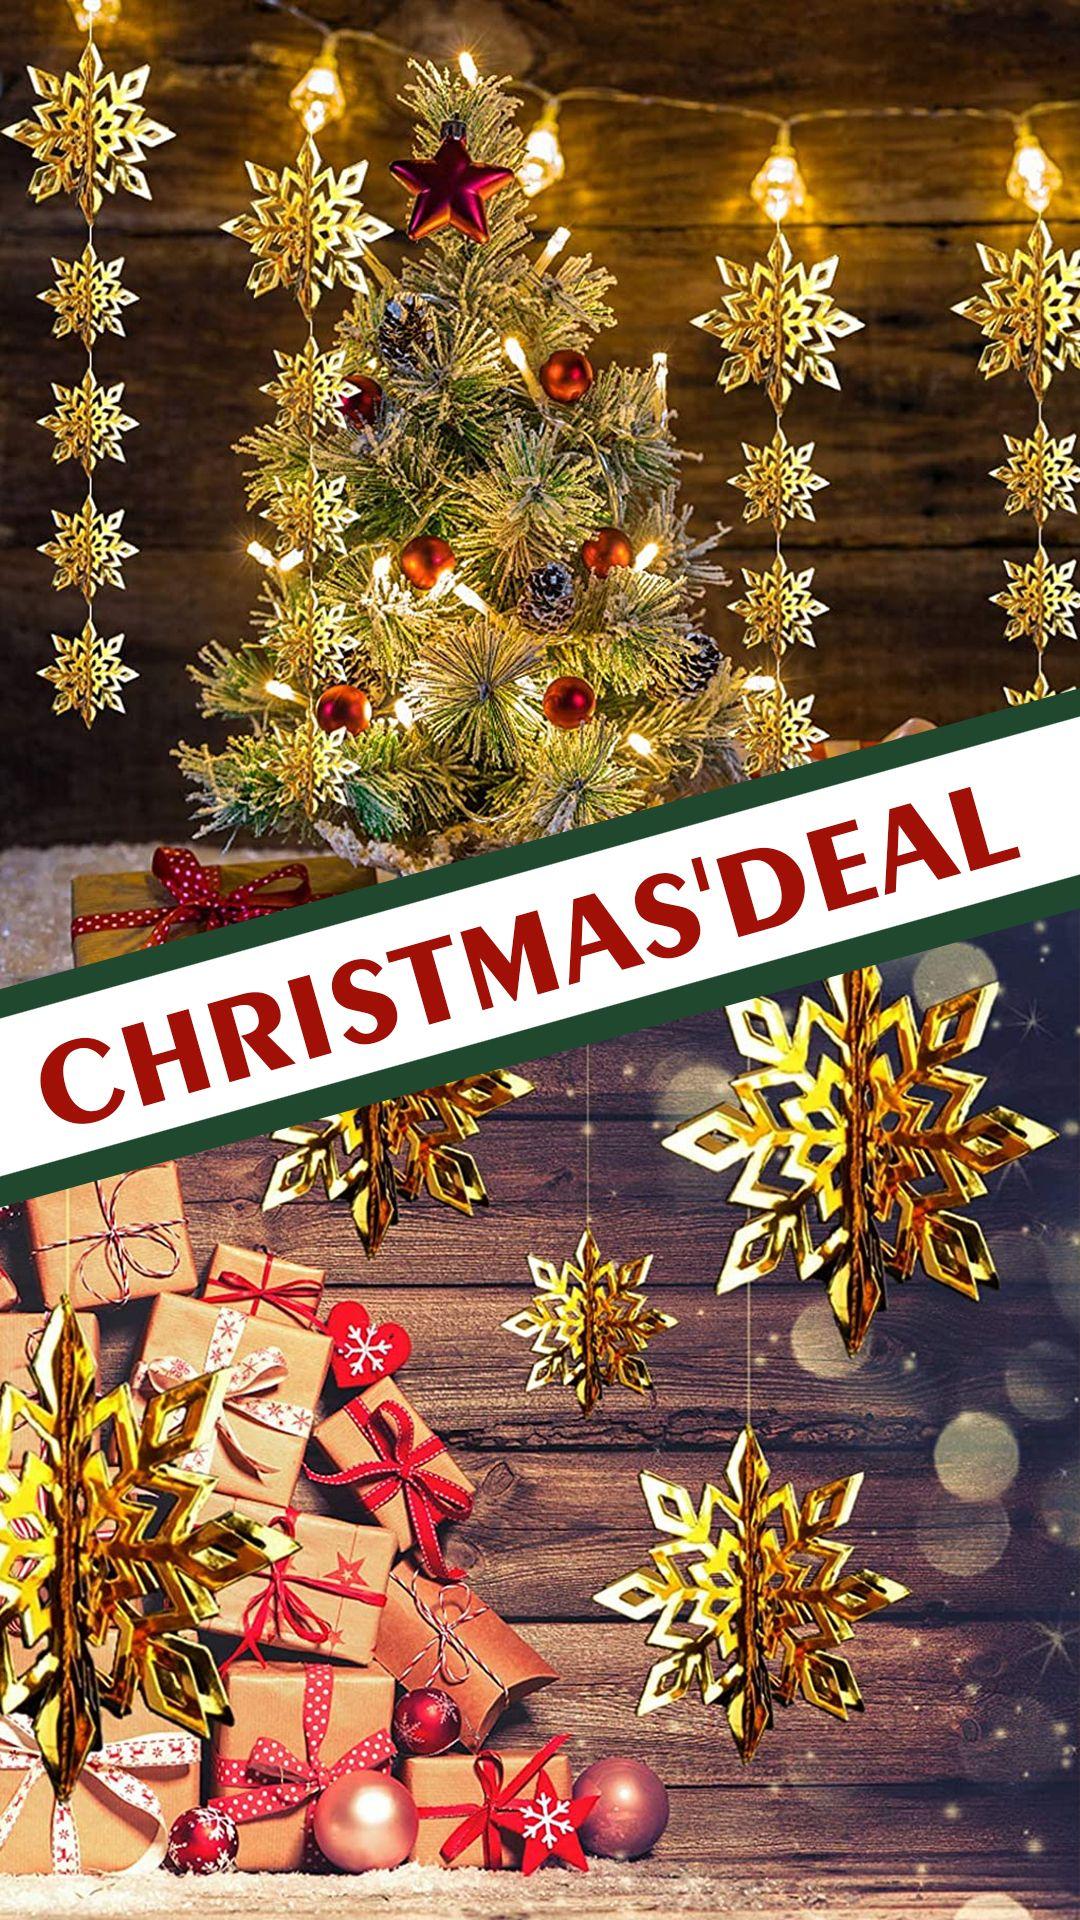 Christmas Gifts Up To 100 Off Christmas Decorations Christmas Crafts For Kids Christmas Gifts